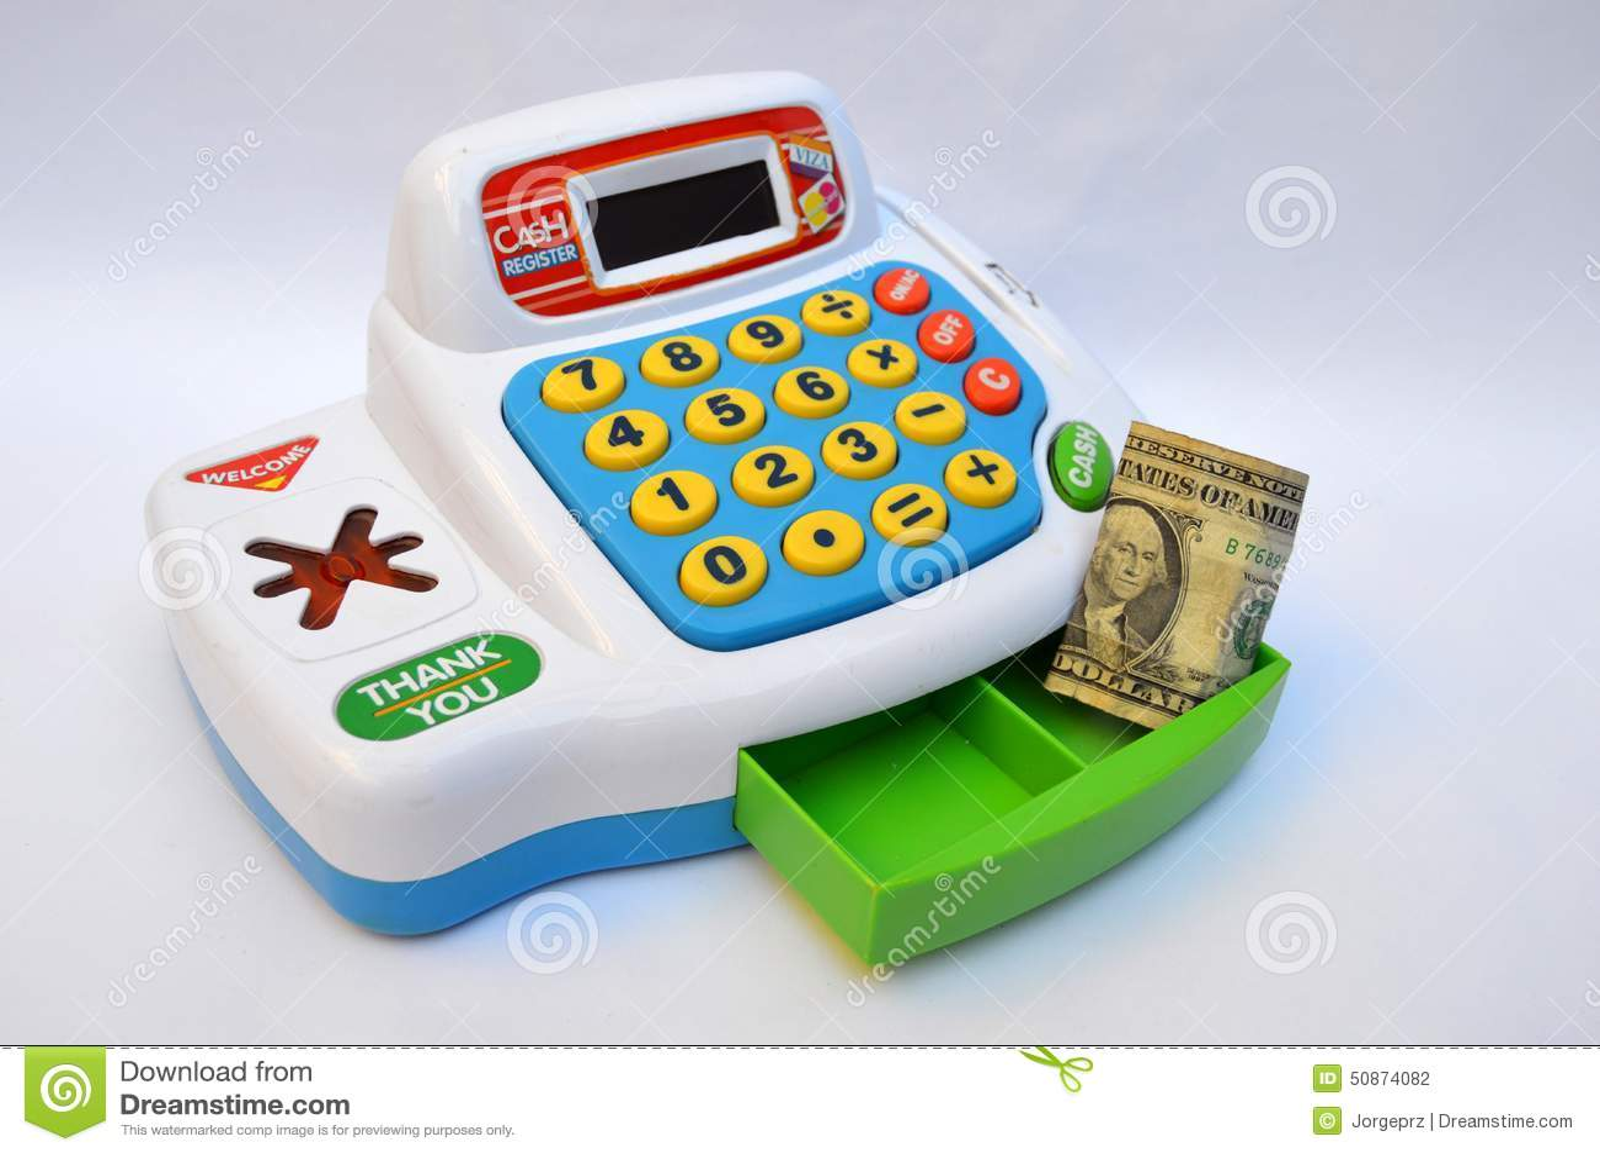 Toy Cash Register Machine Stock Photo - Image: 50874082